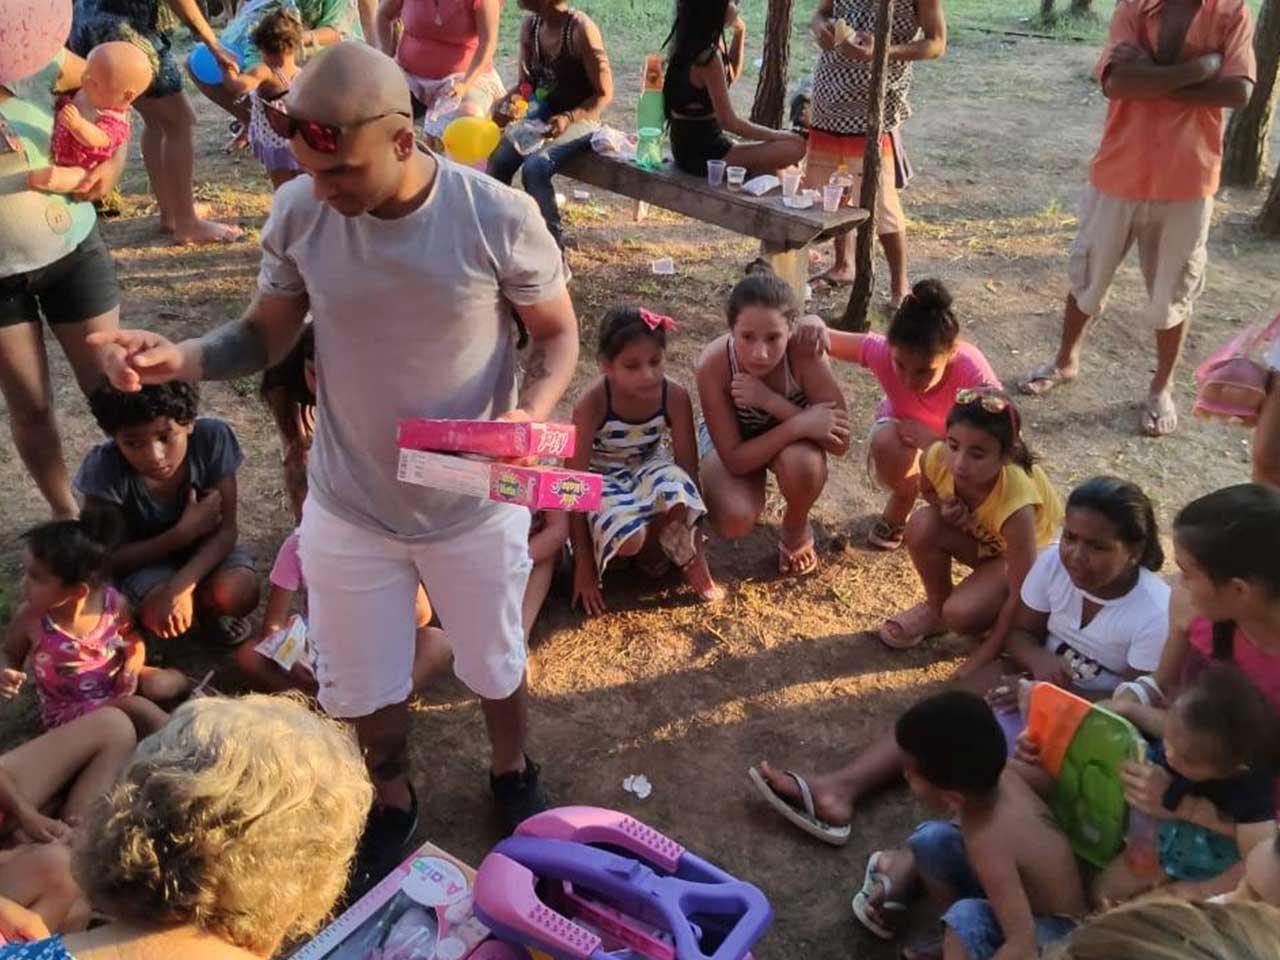 Children's Day in Brazil: the Object Edge Campaign